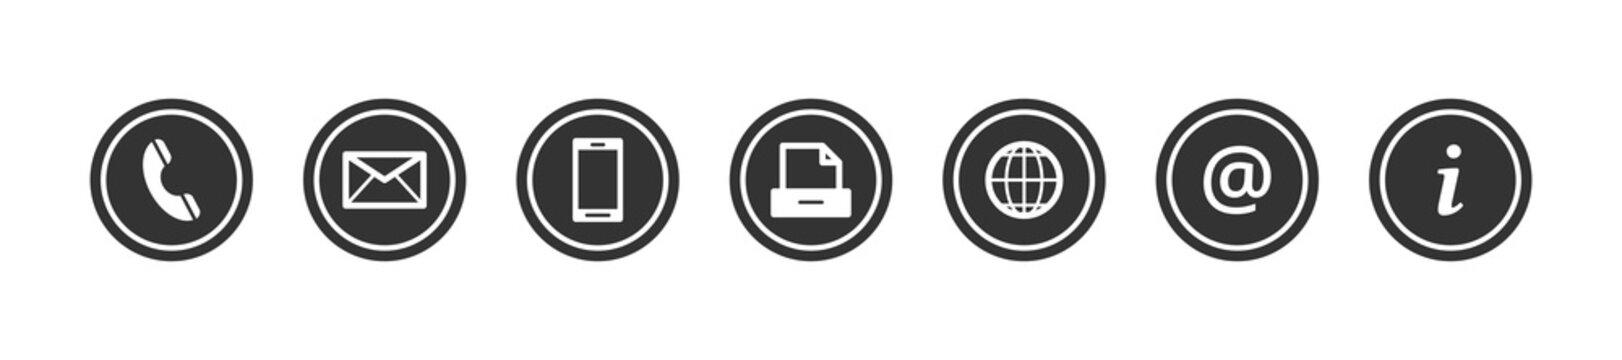 Contact us - set of dark grey buttons